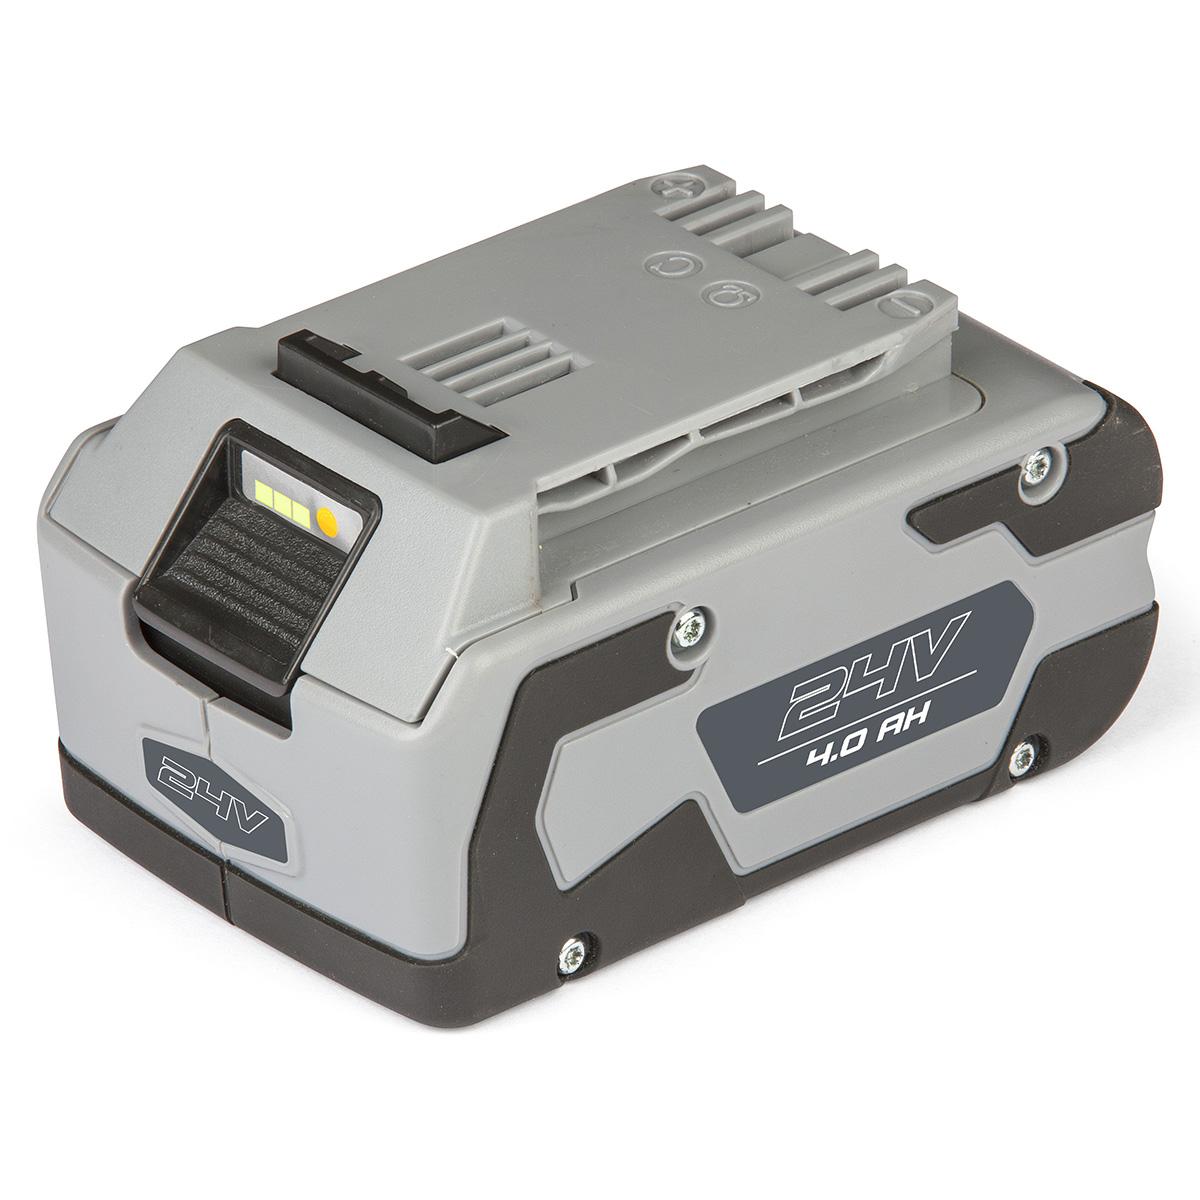 Image of   Stiga batteri - SBT 4024 AE